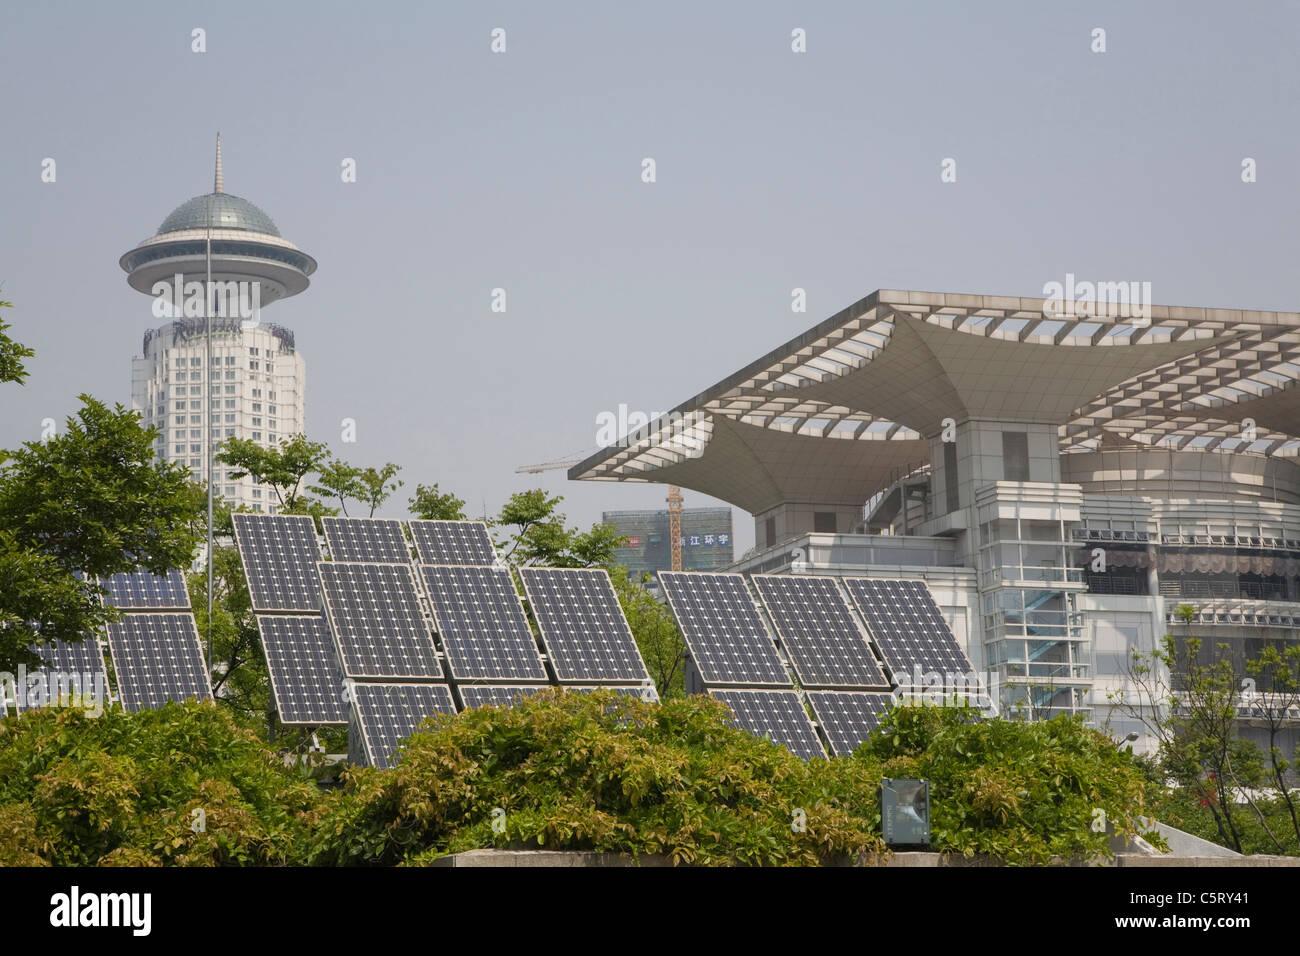 China, Shanghai, Puxi, Volkspark, Solar collectors - Stock Image